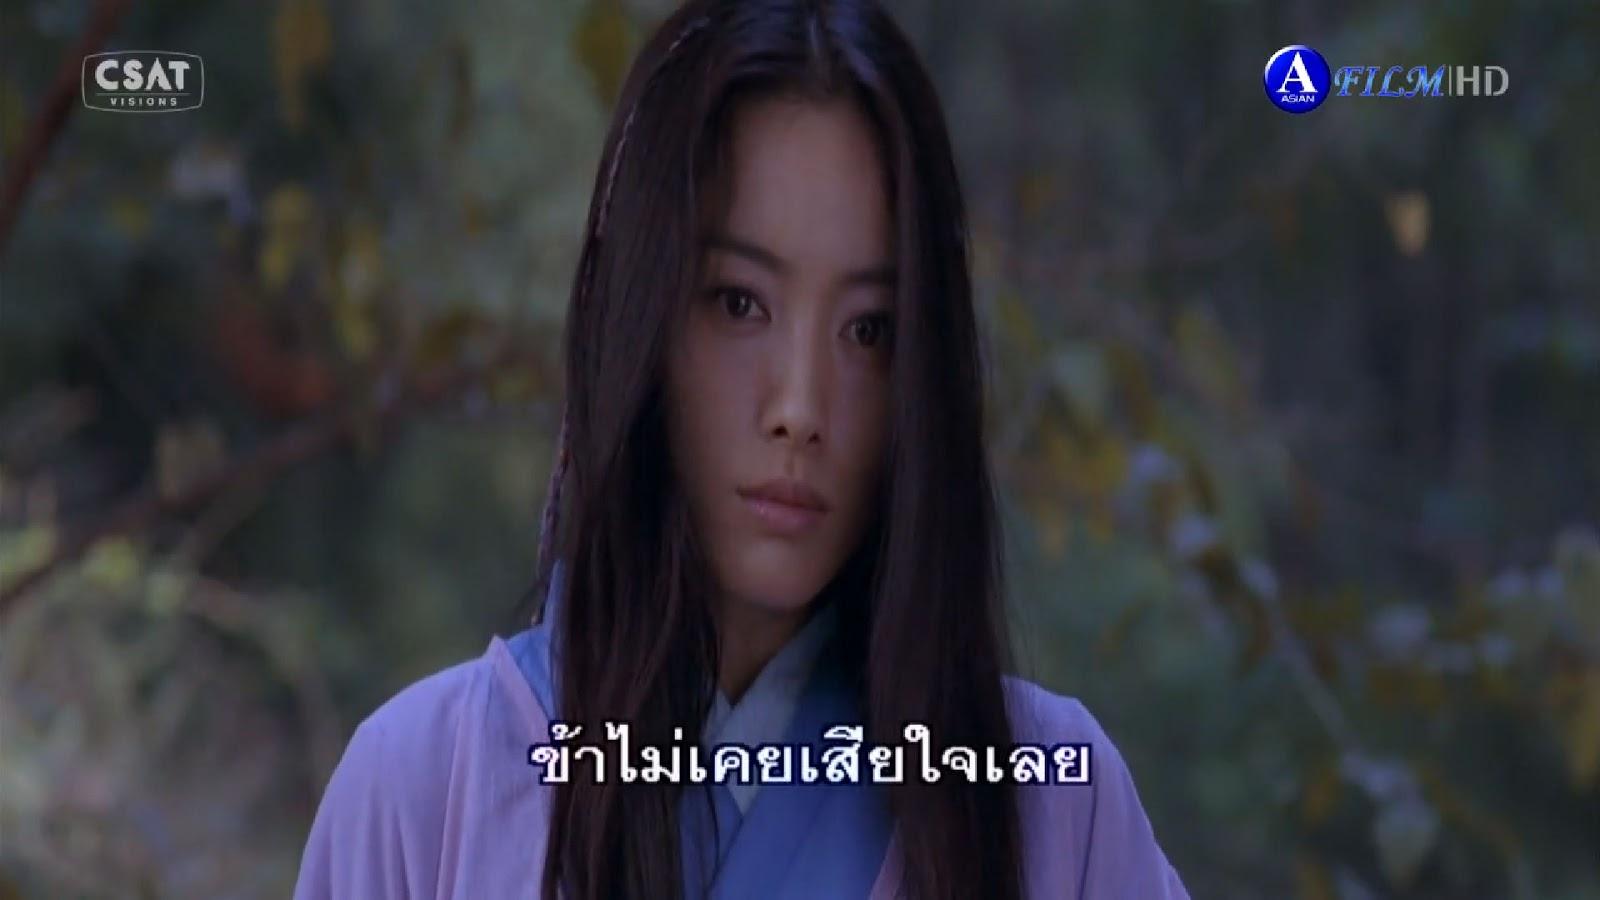 Frekuensi siaran A Film HD di satelit Thaicom 5 Terbaru